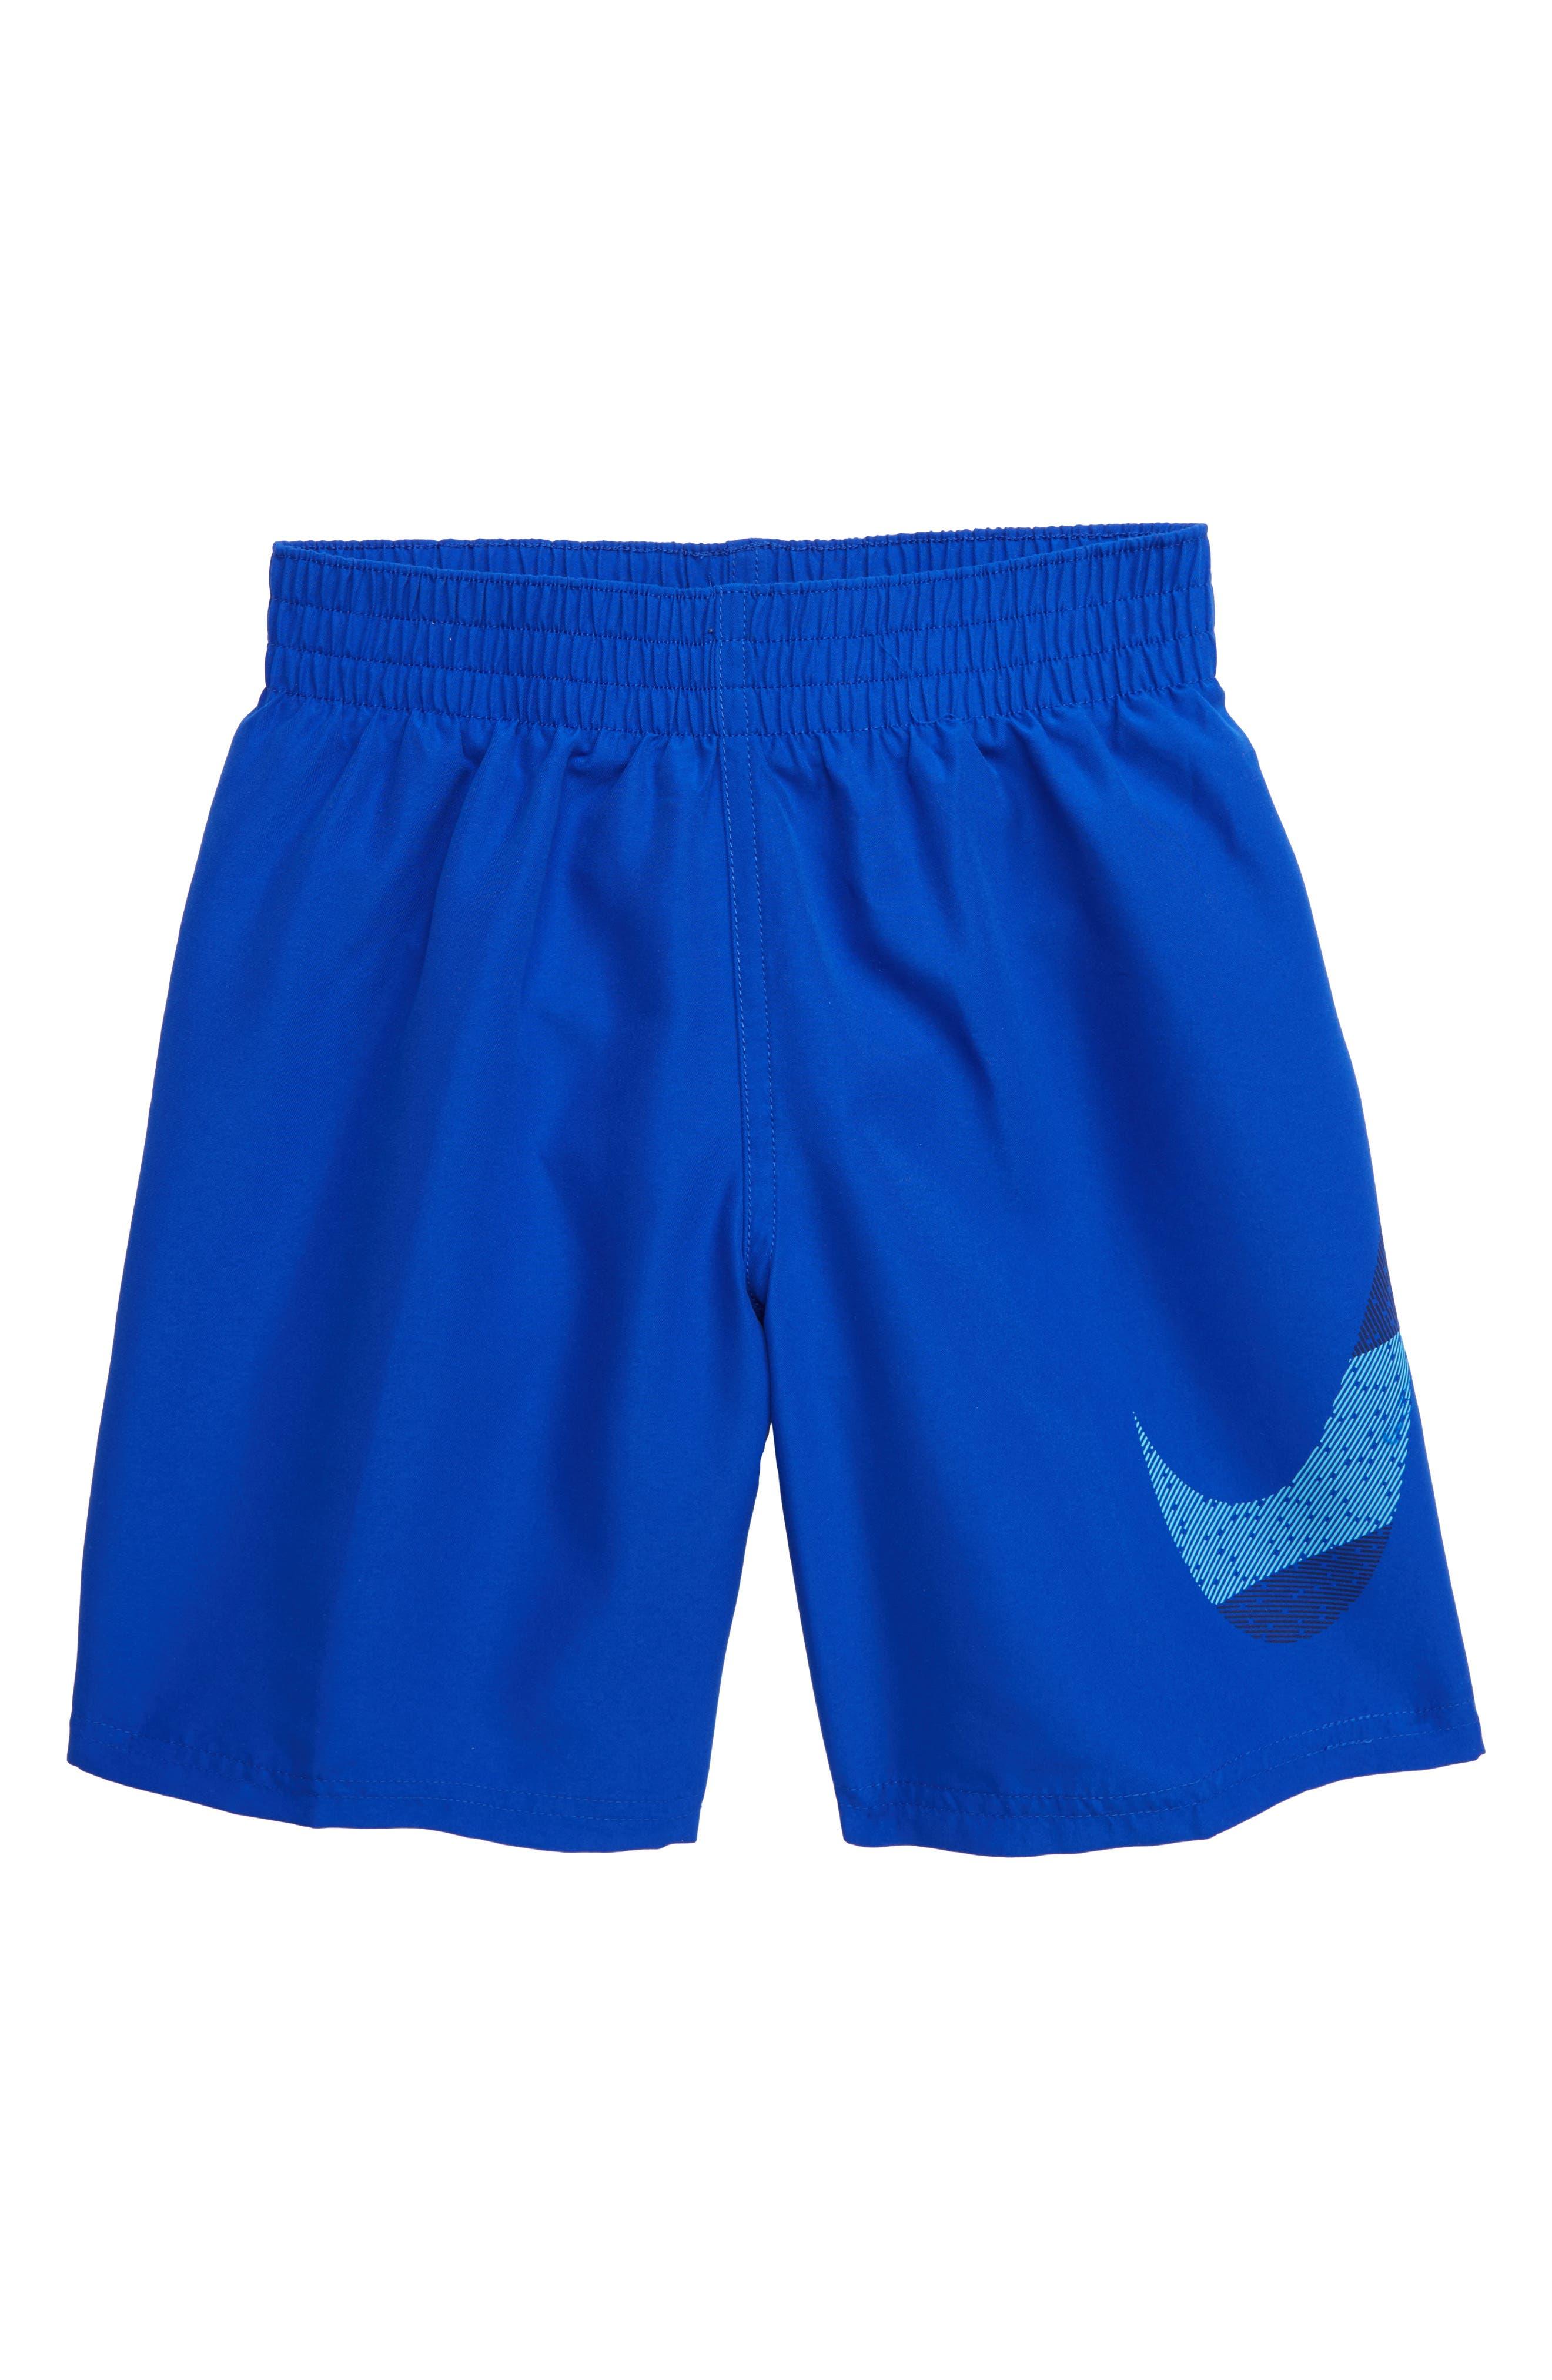 NIKE Mash-Up Breaker Volley Shorts, Main, color, HYPER ROYAL